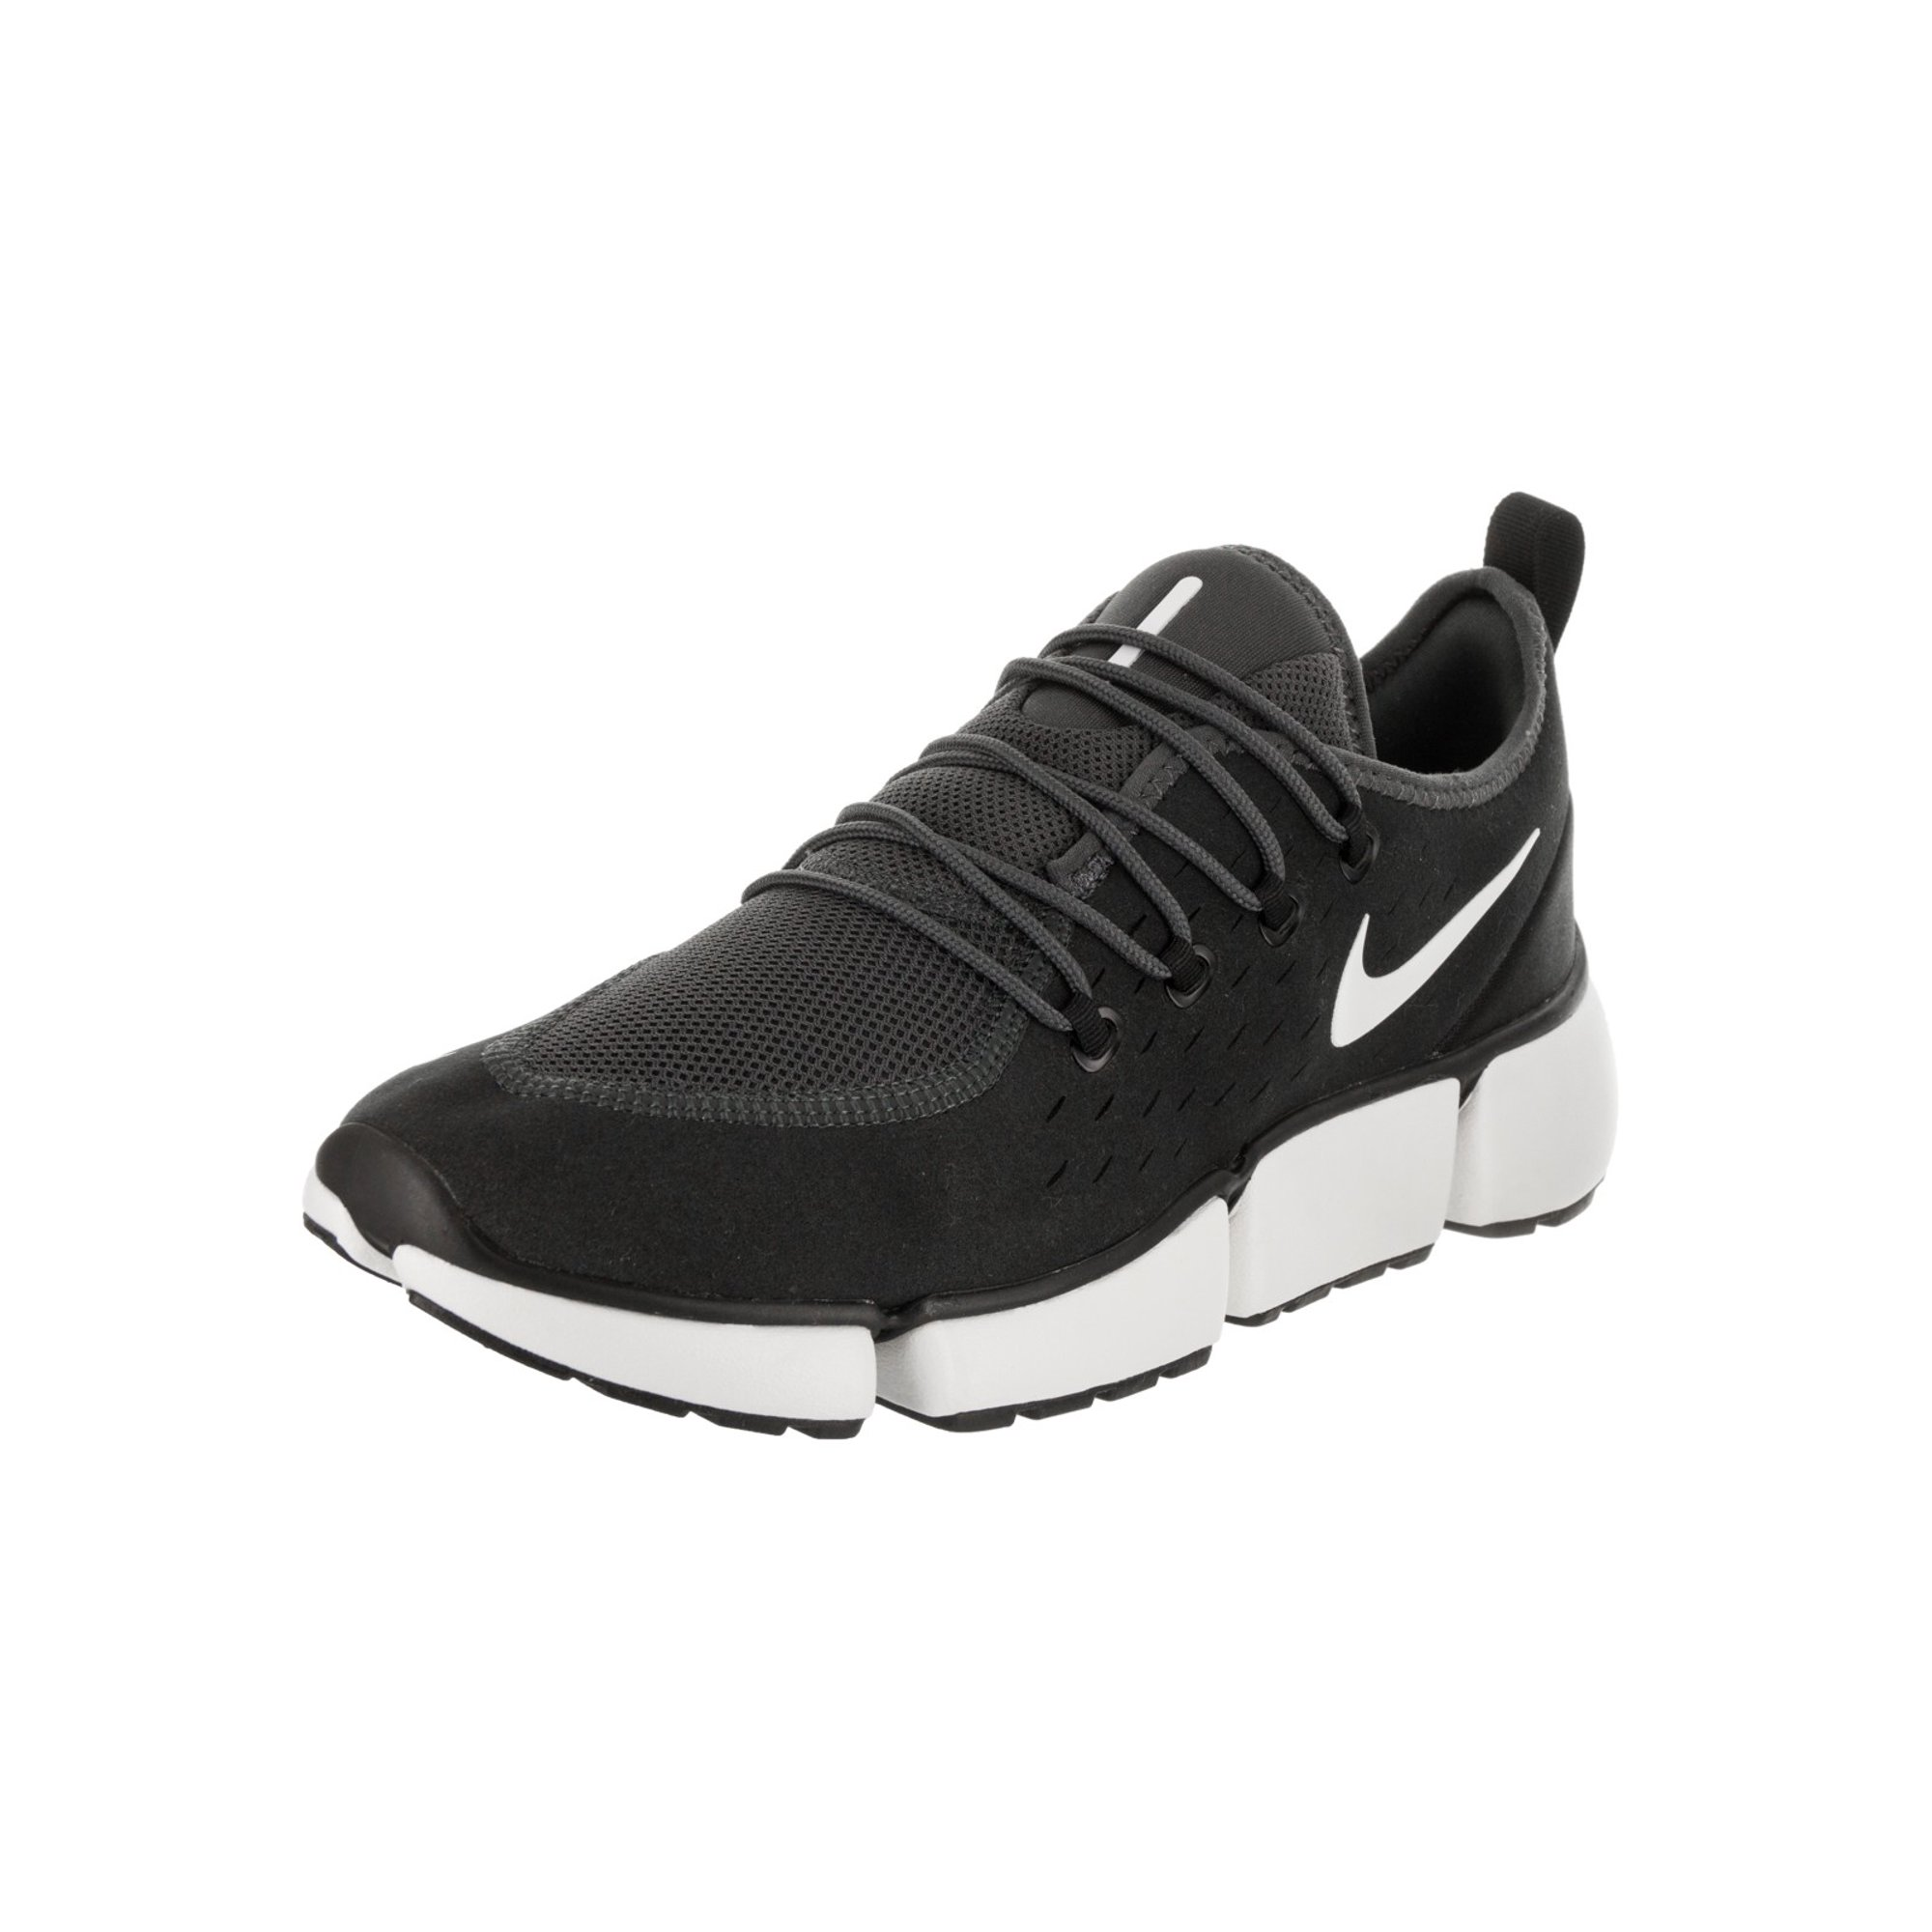 buy popular 1e6bd 552f7 Nike Men's Pocket Fly DM Casual Shoe